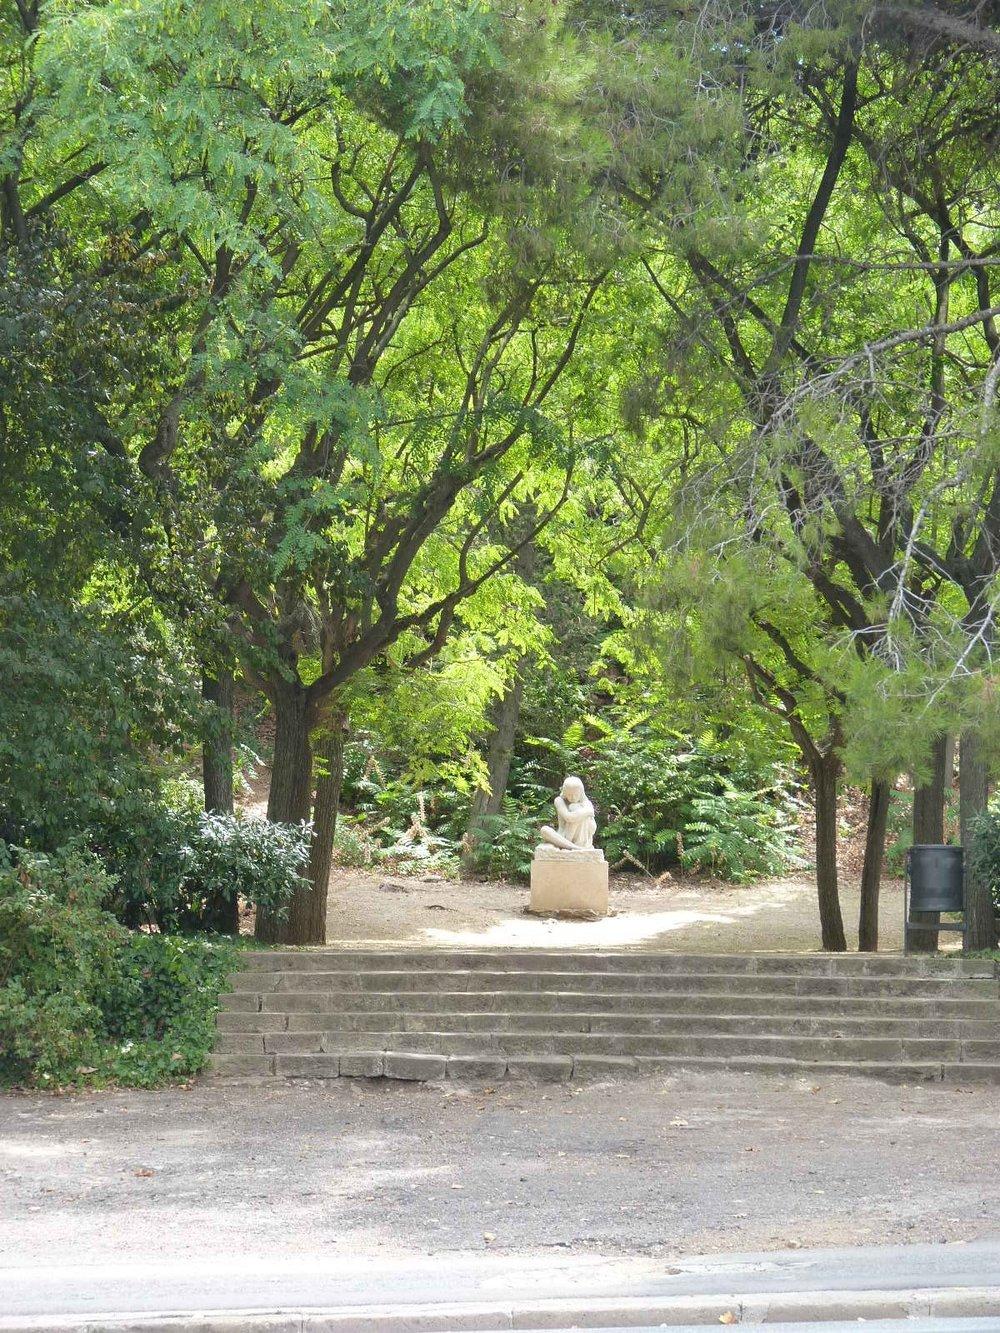 Barcelona-Beautiful-Gardens-e1377426461179.jpg